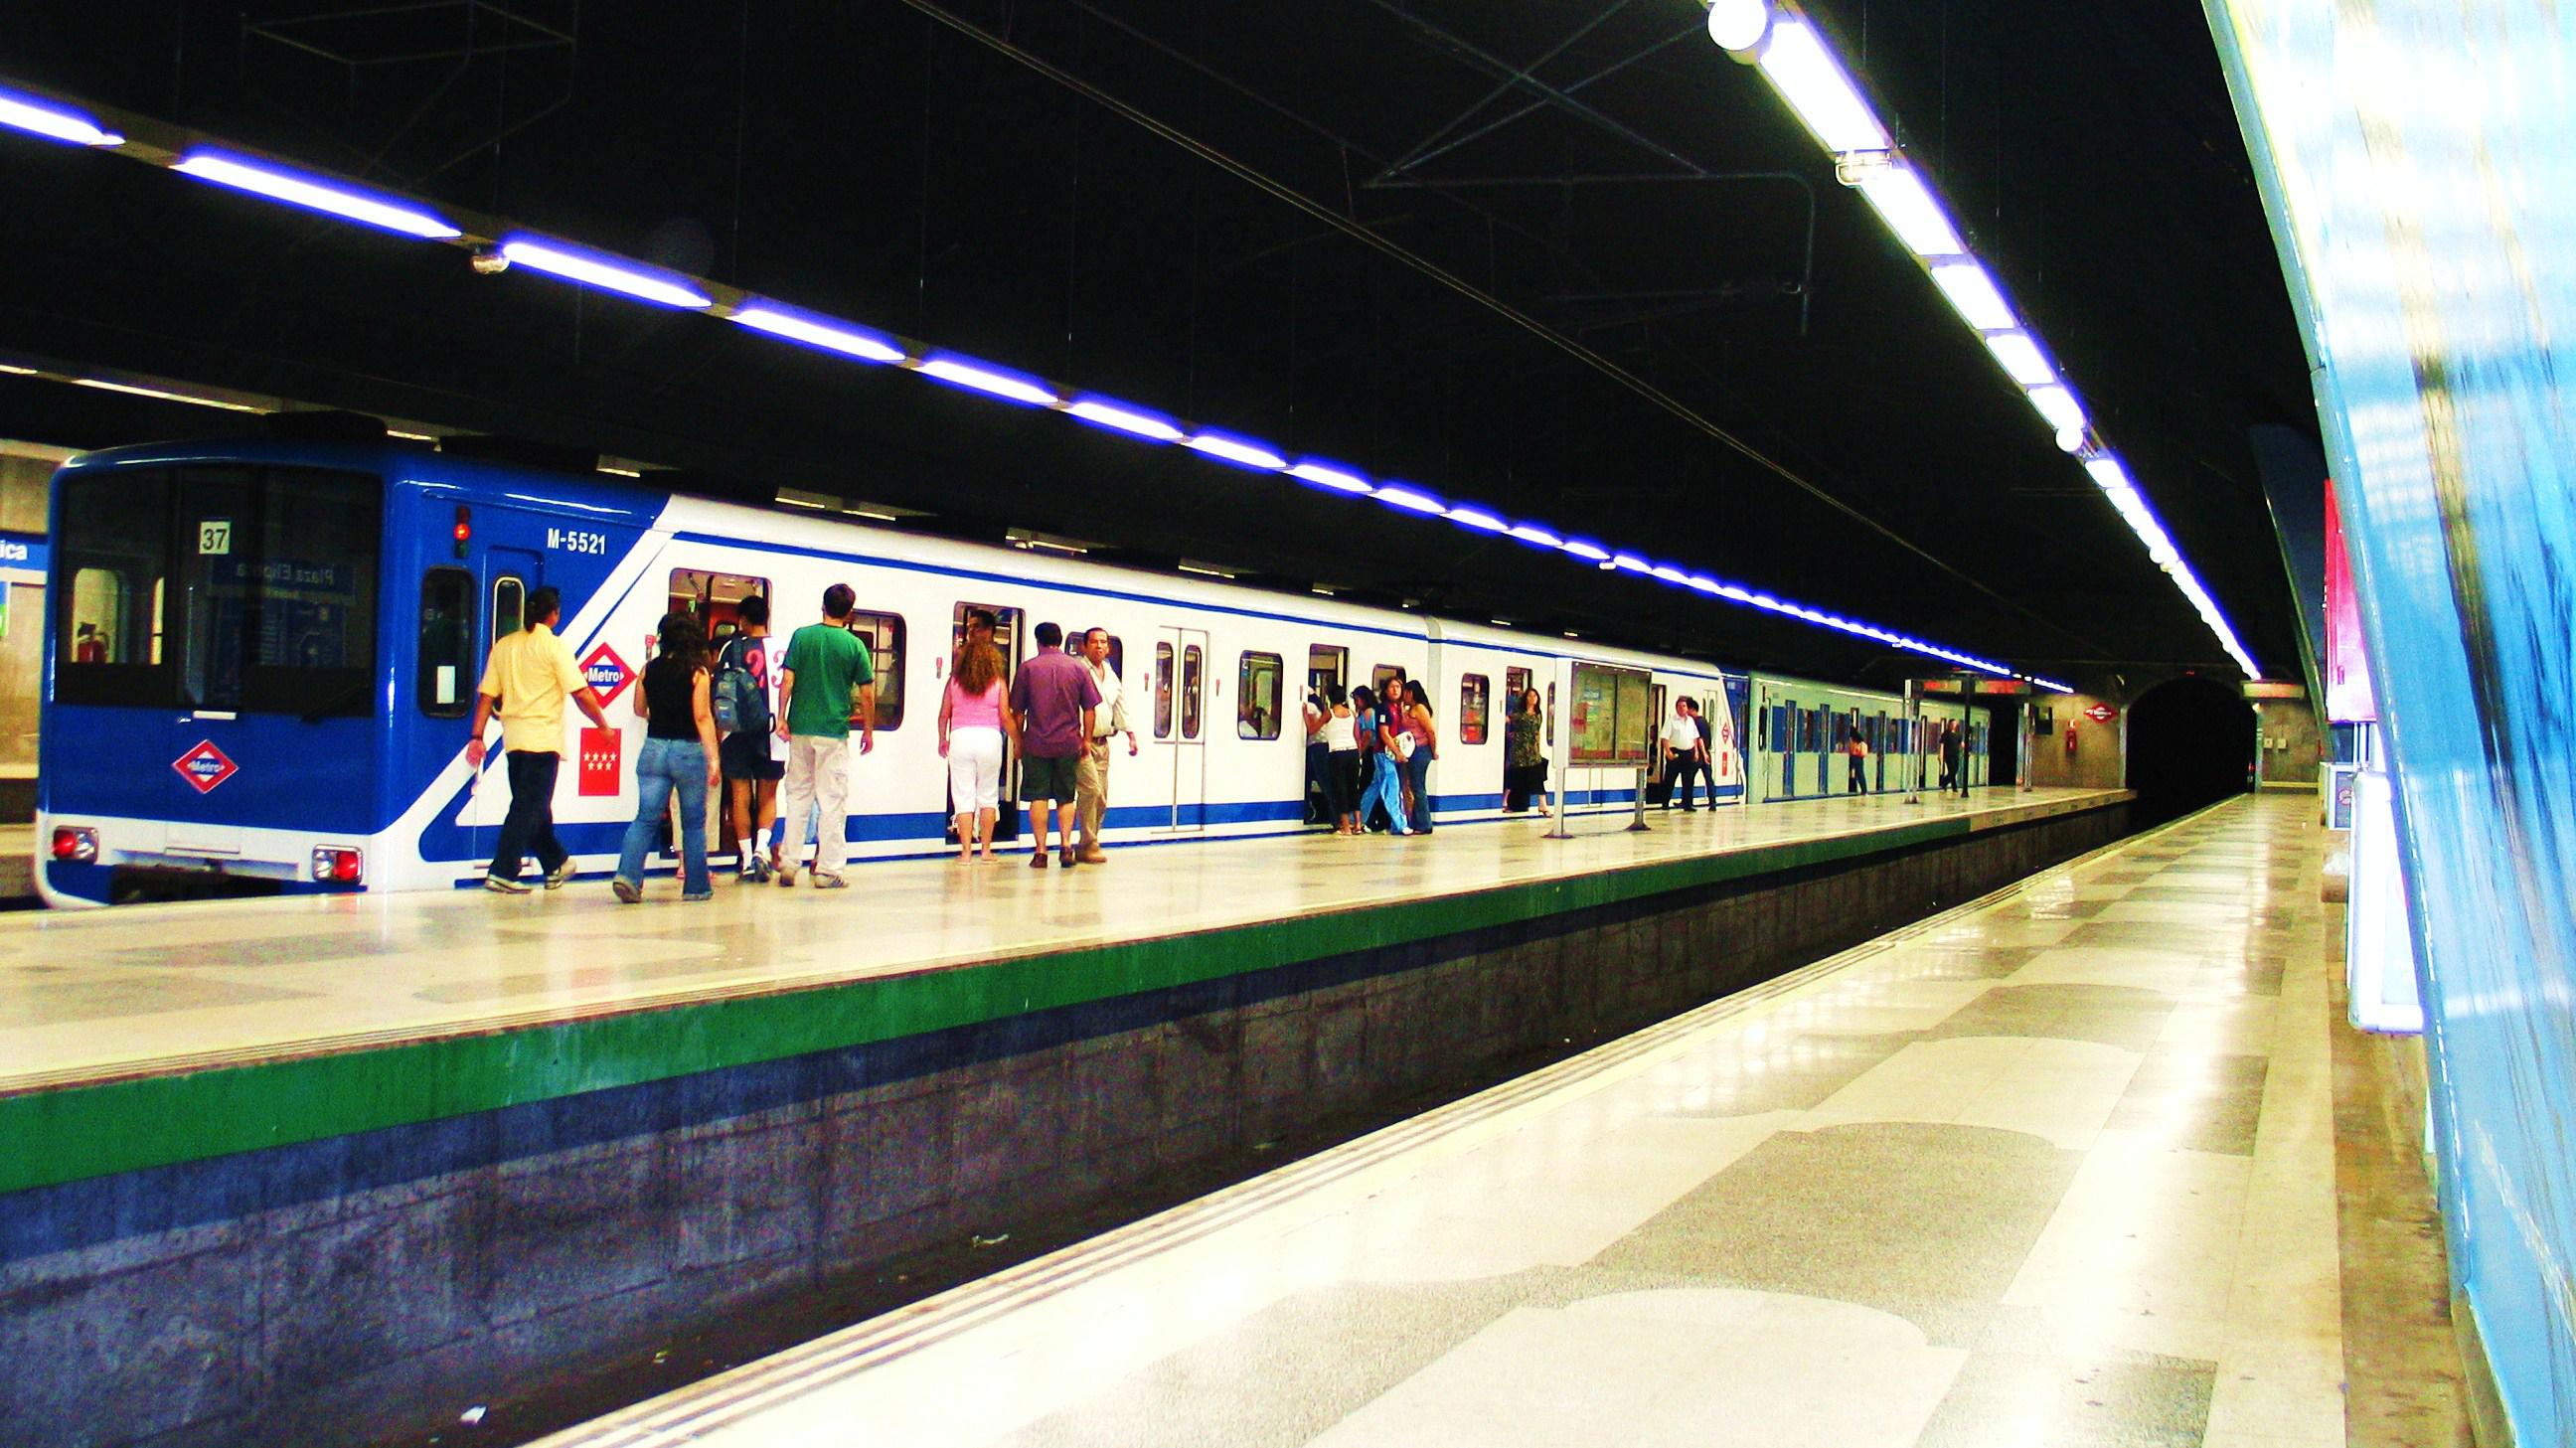 Conoce el transporte público de Madrid | LAE Madrid – Spanish ...